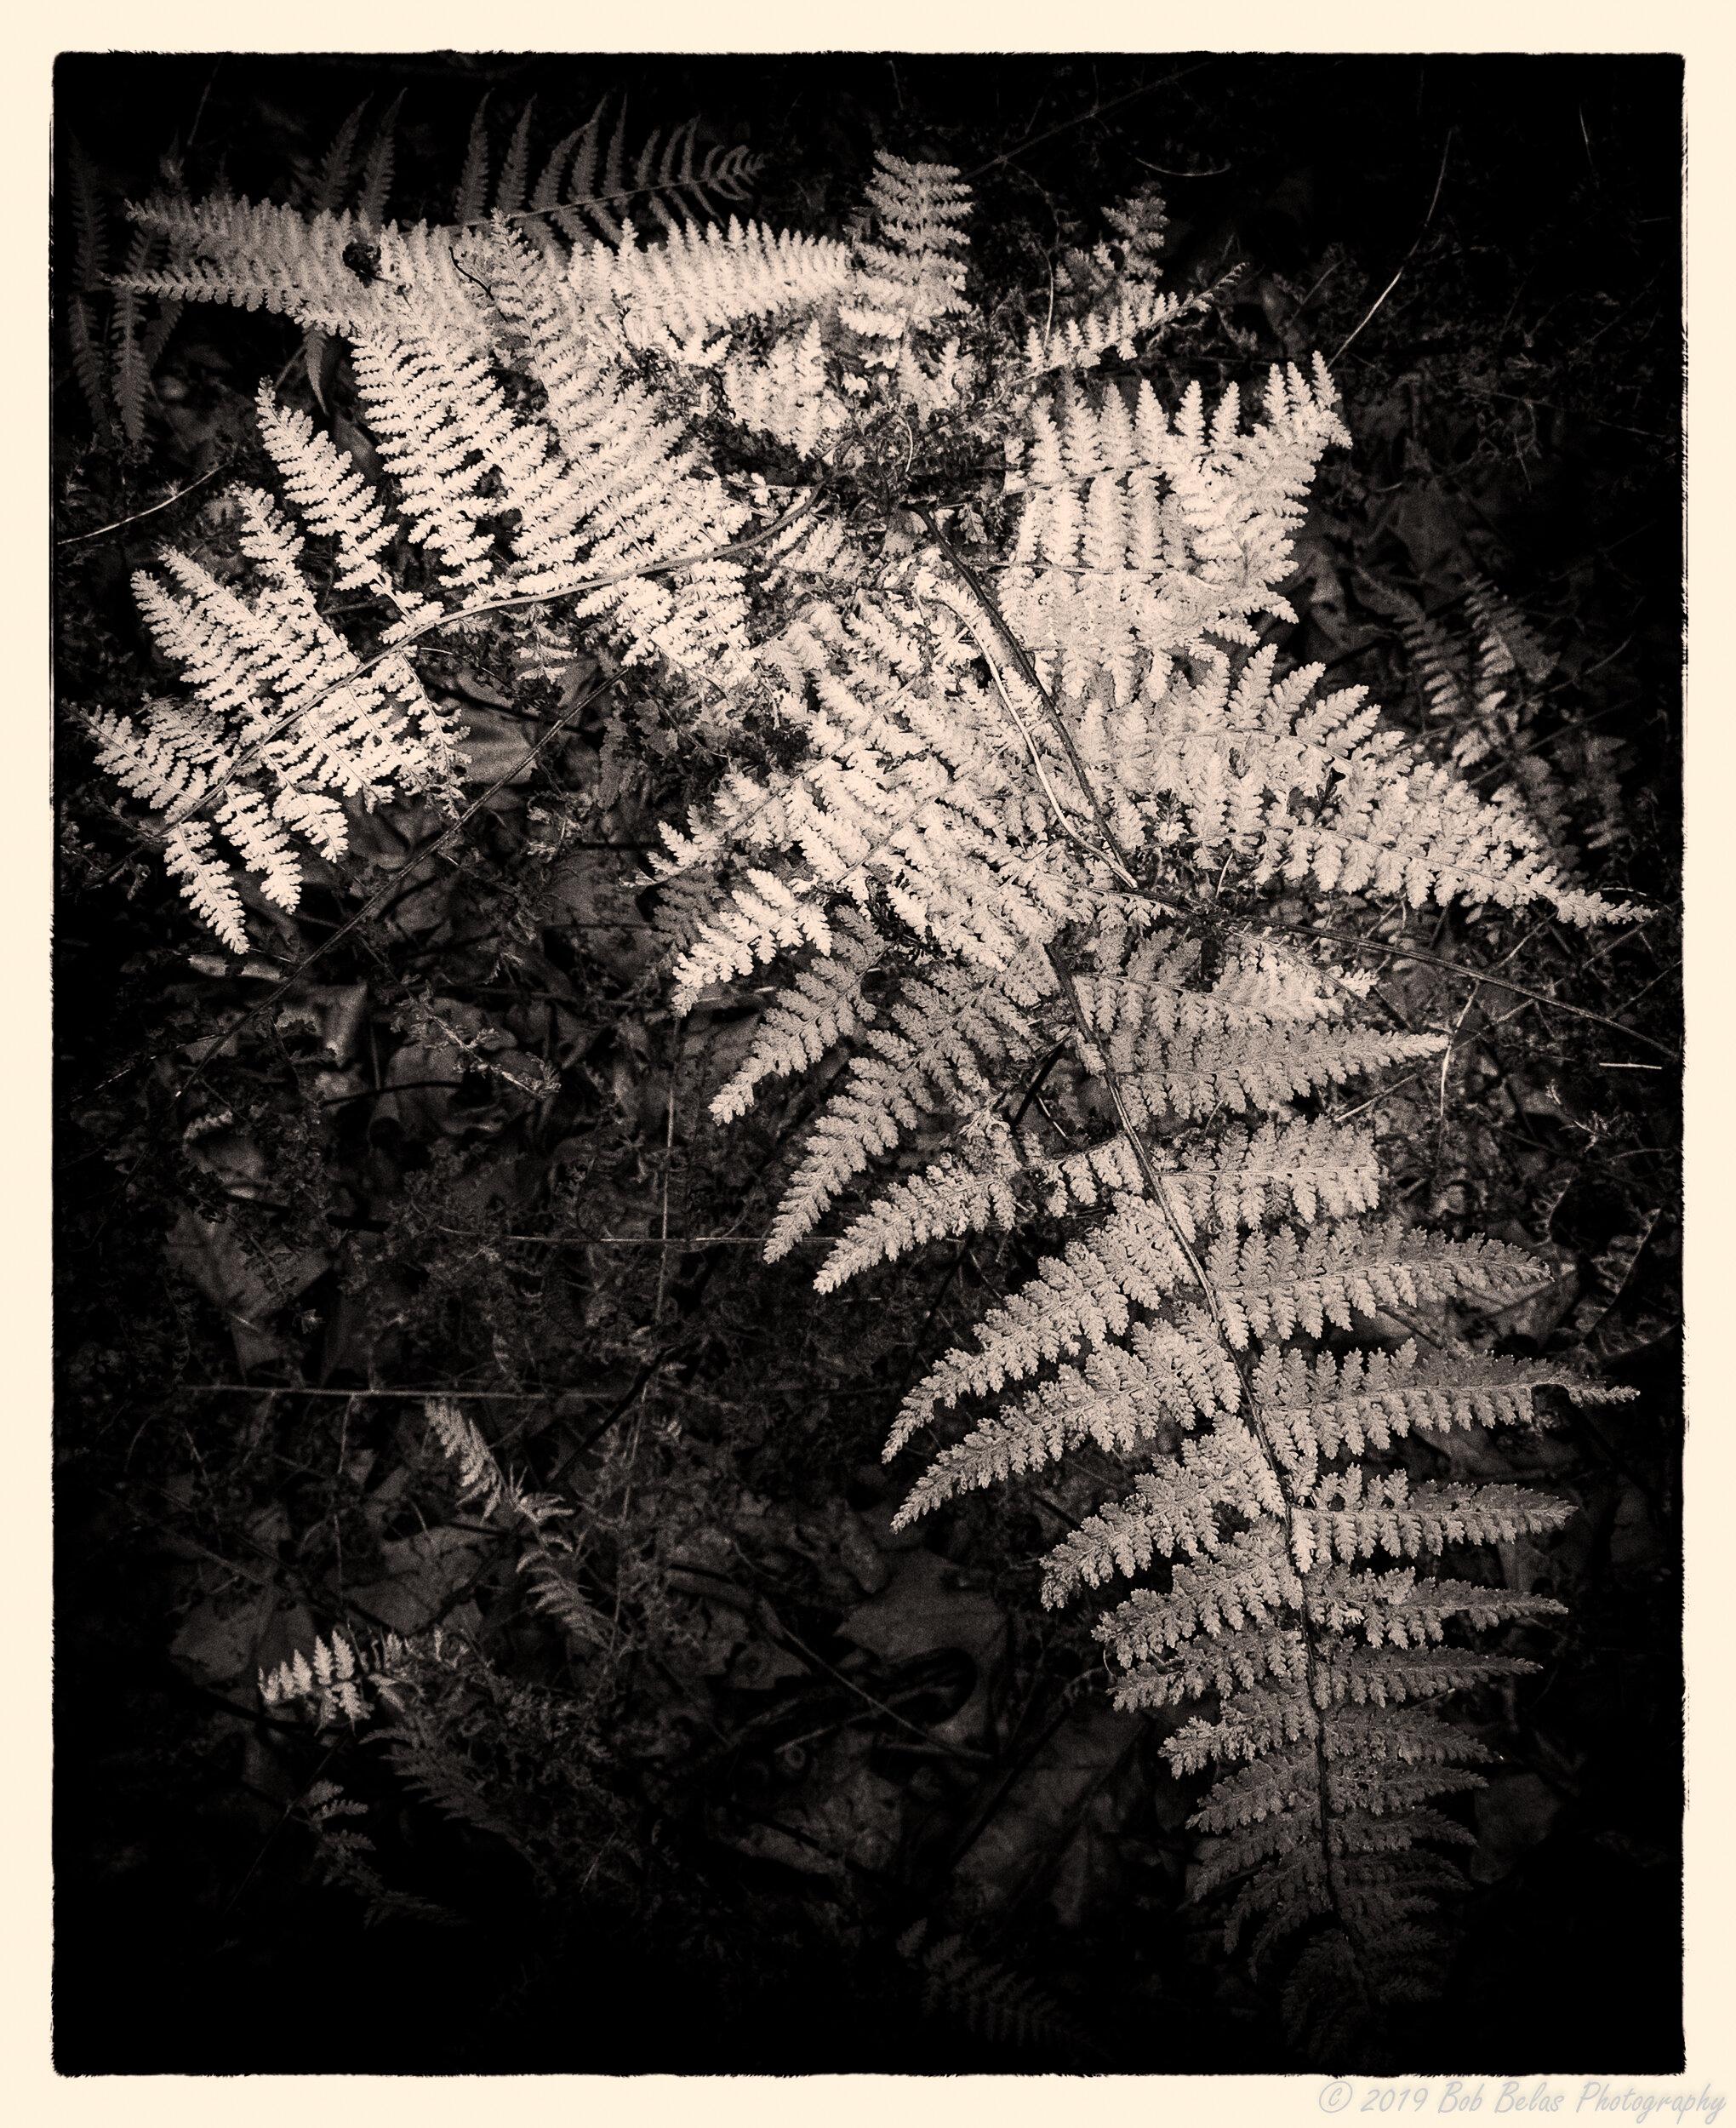 Ferns at dusk 4, monochrome